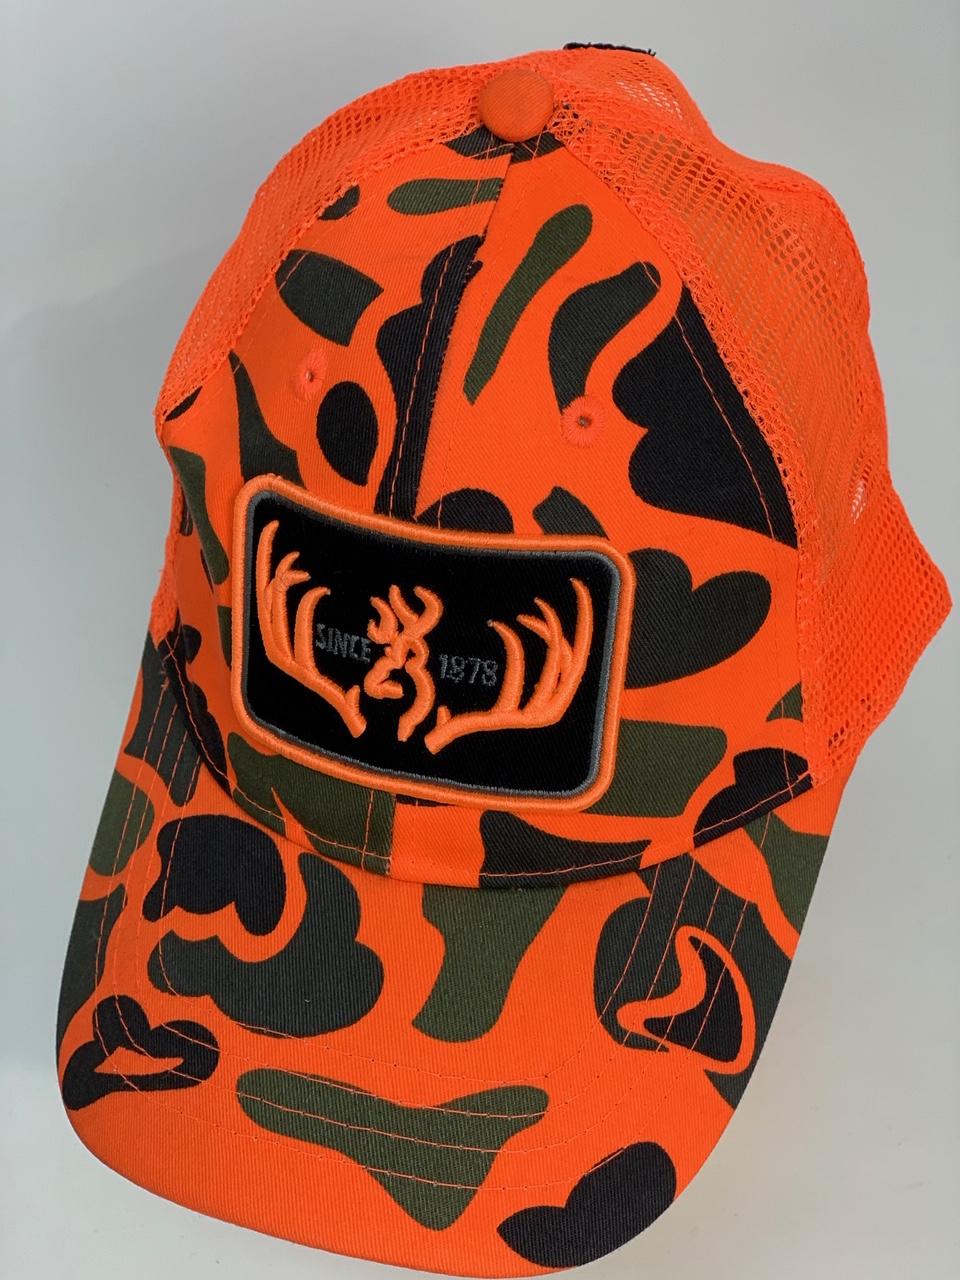 Ярко-оранжевая бейсболка милитари